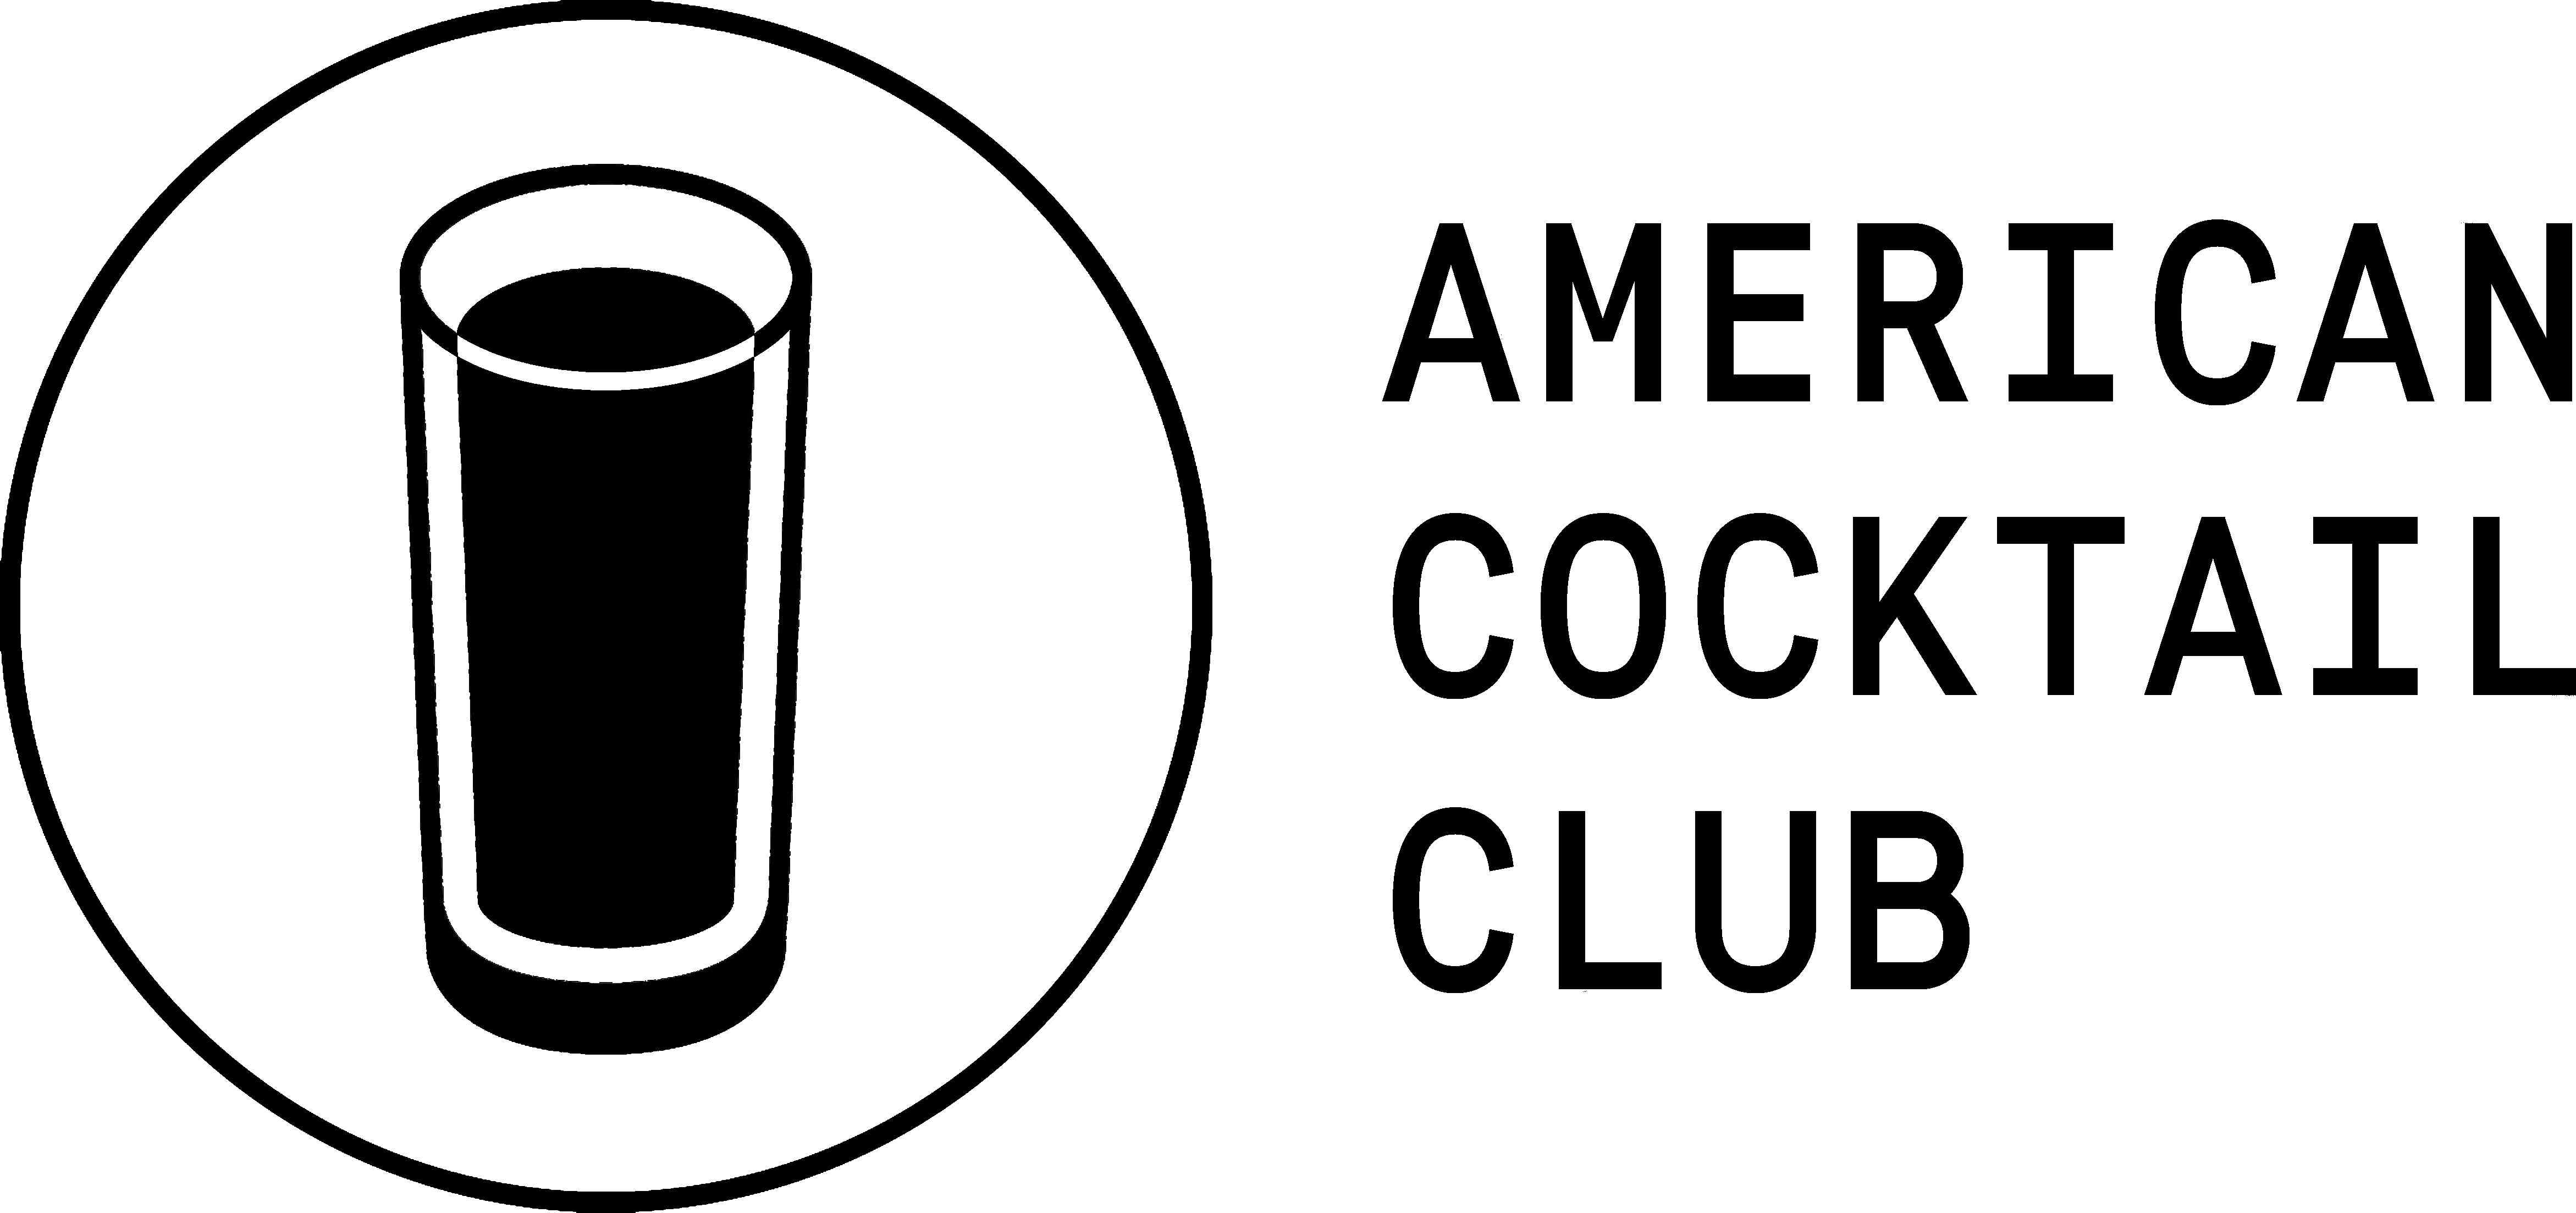 American Cocktail Club